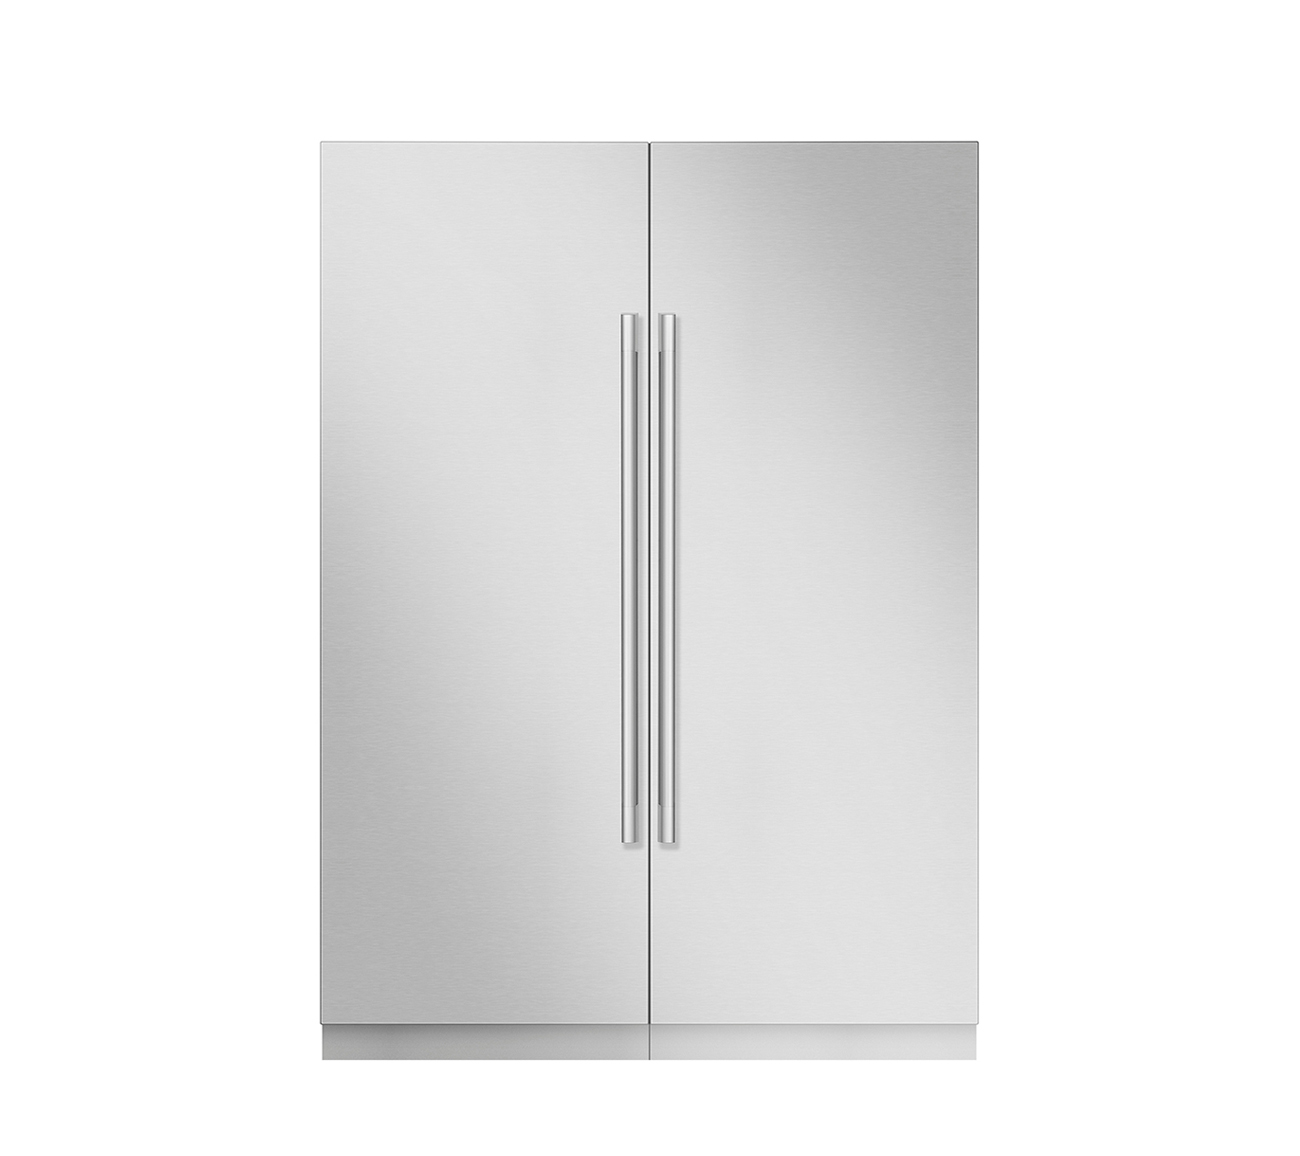 Signature Kitchen Suite   30-inch Integrated Column Freezer